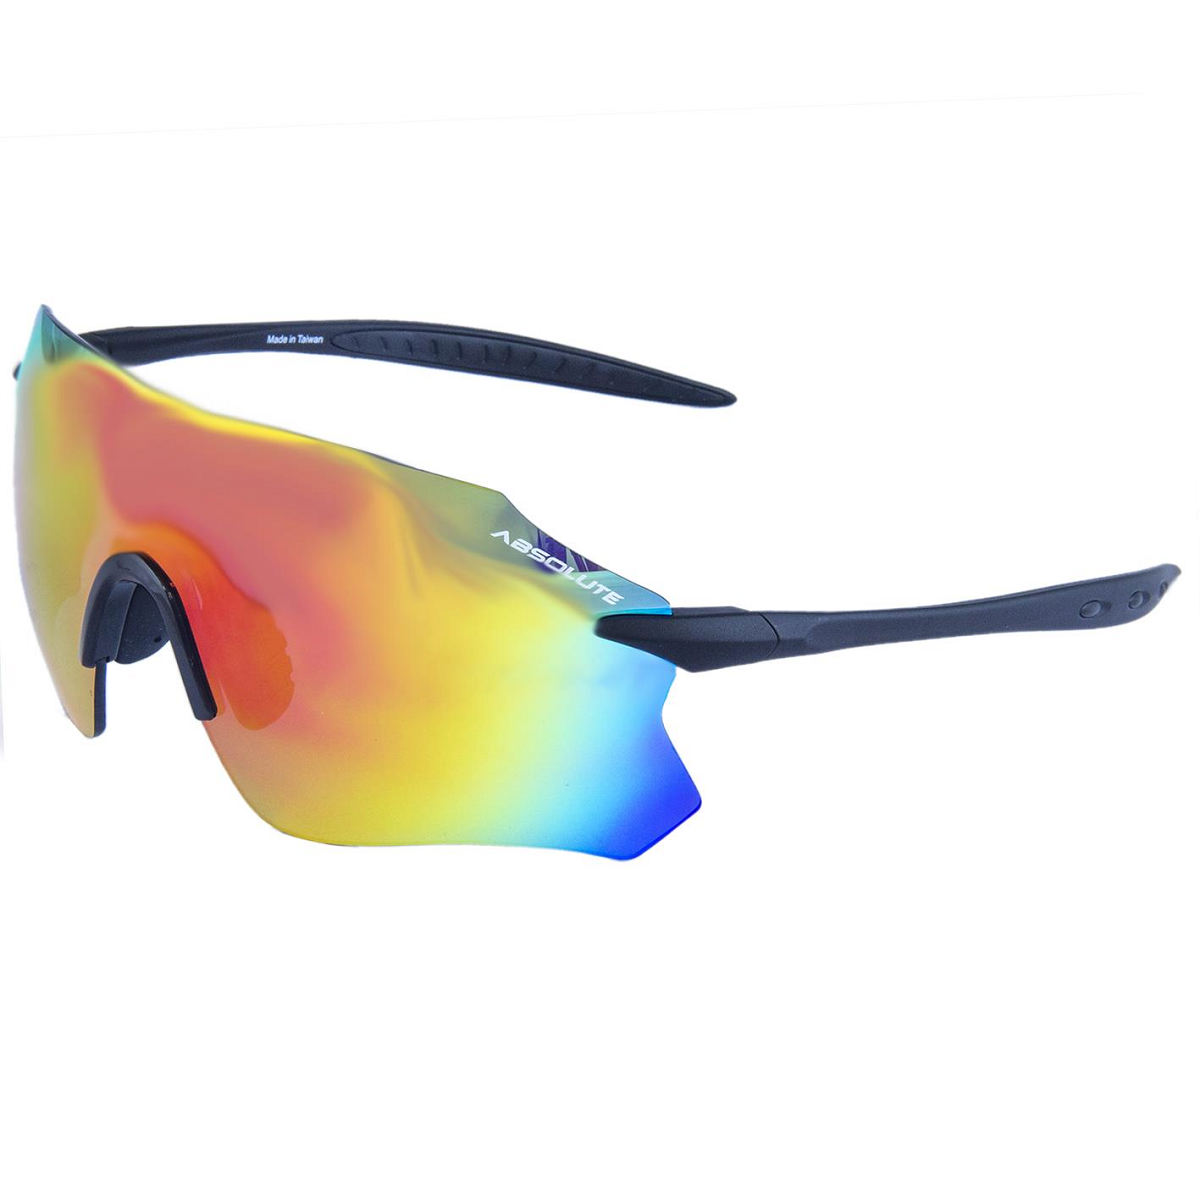 Oculos Absolute Prime Sl Pto Fosc, Lente Verm